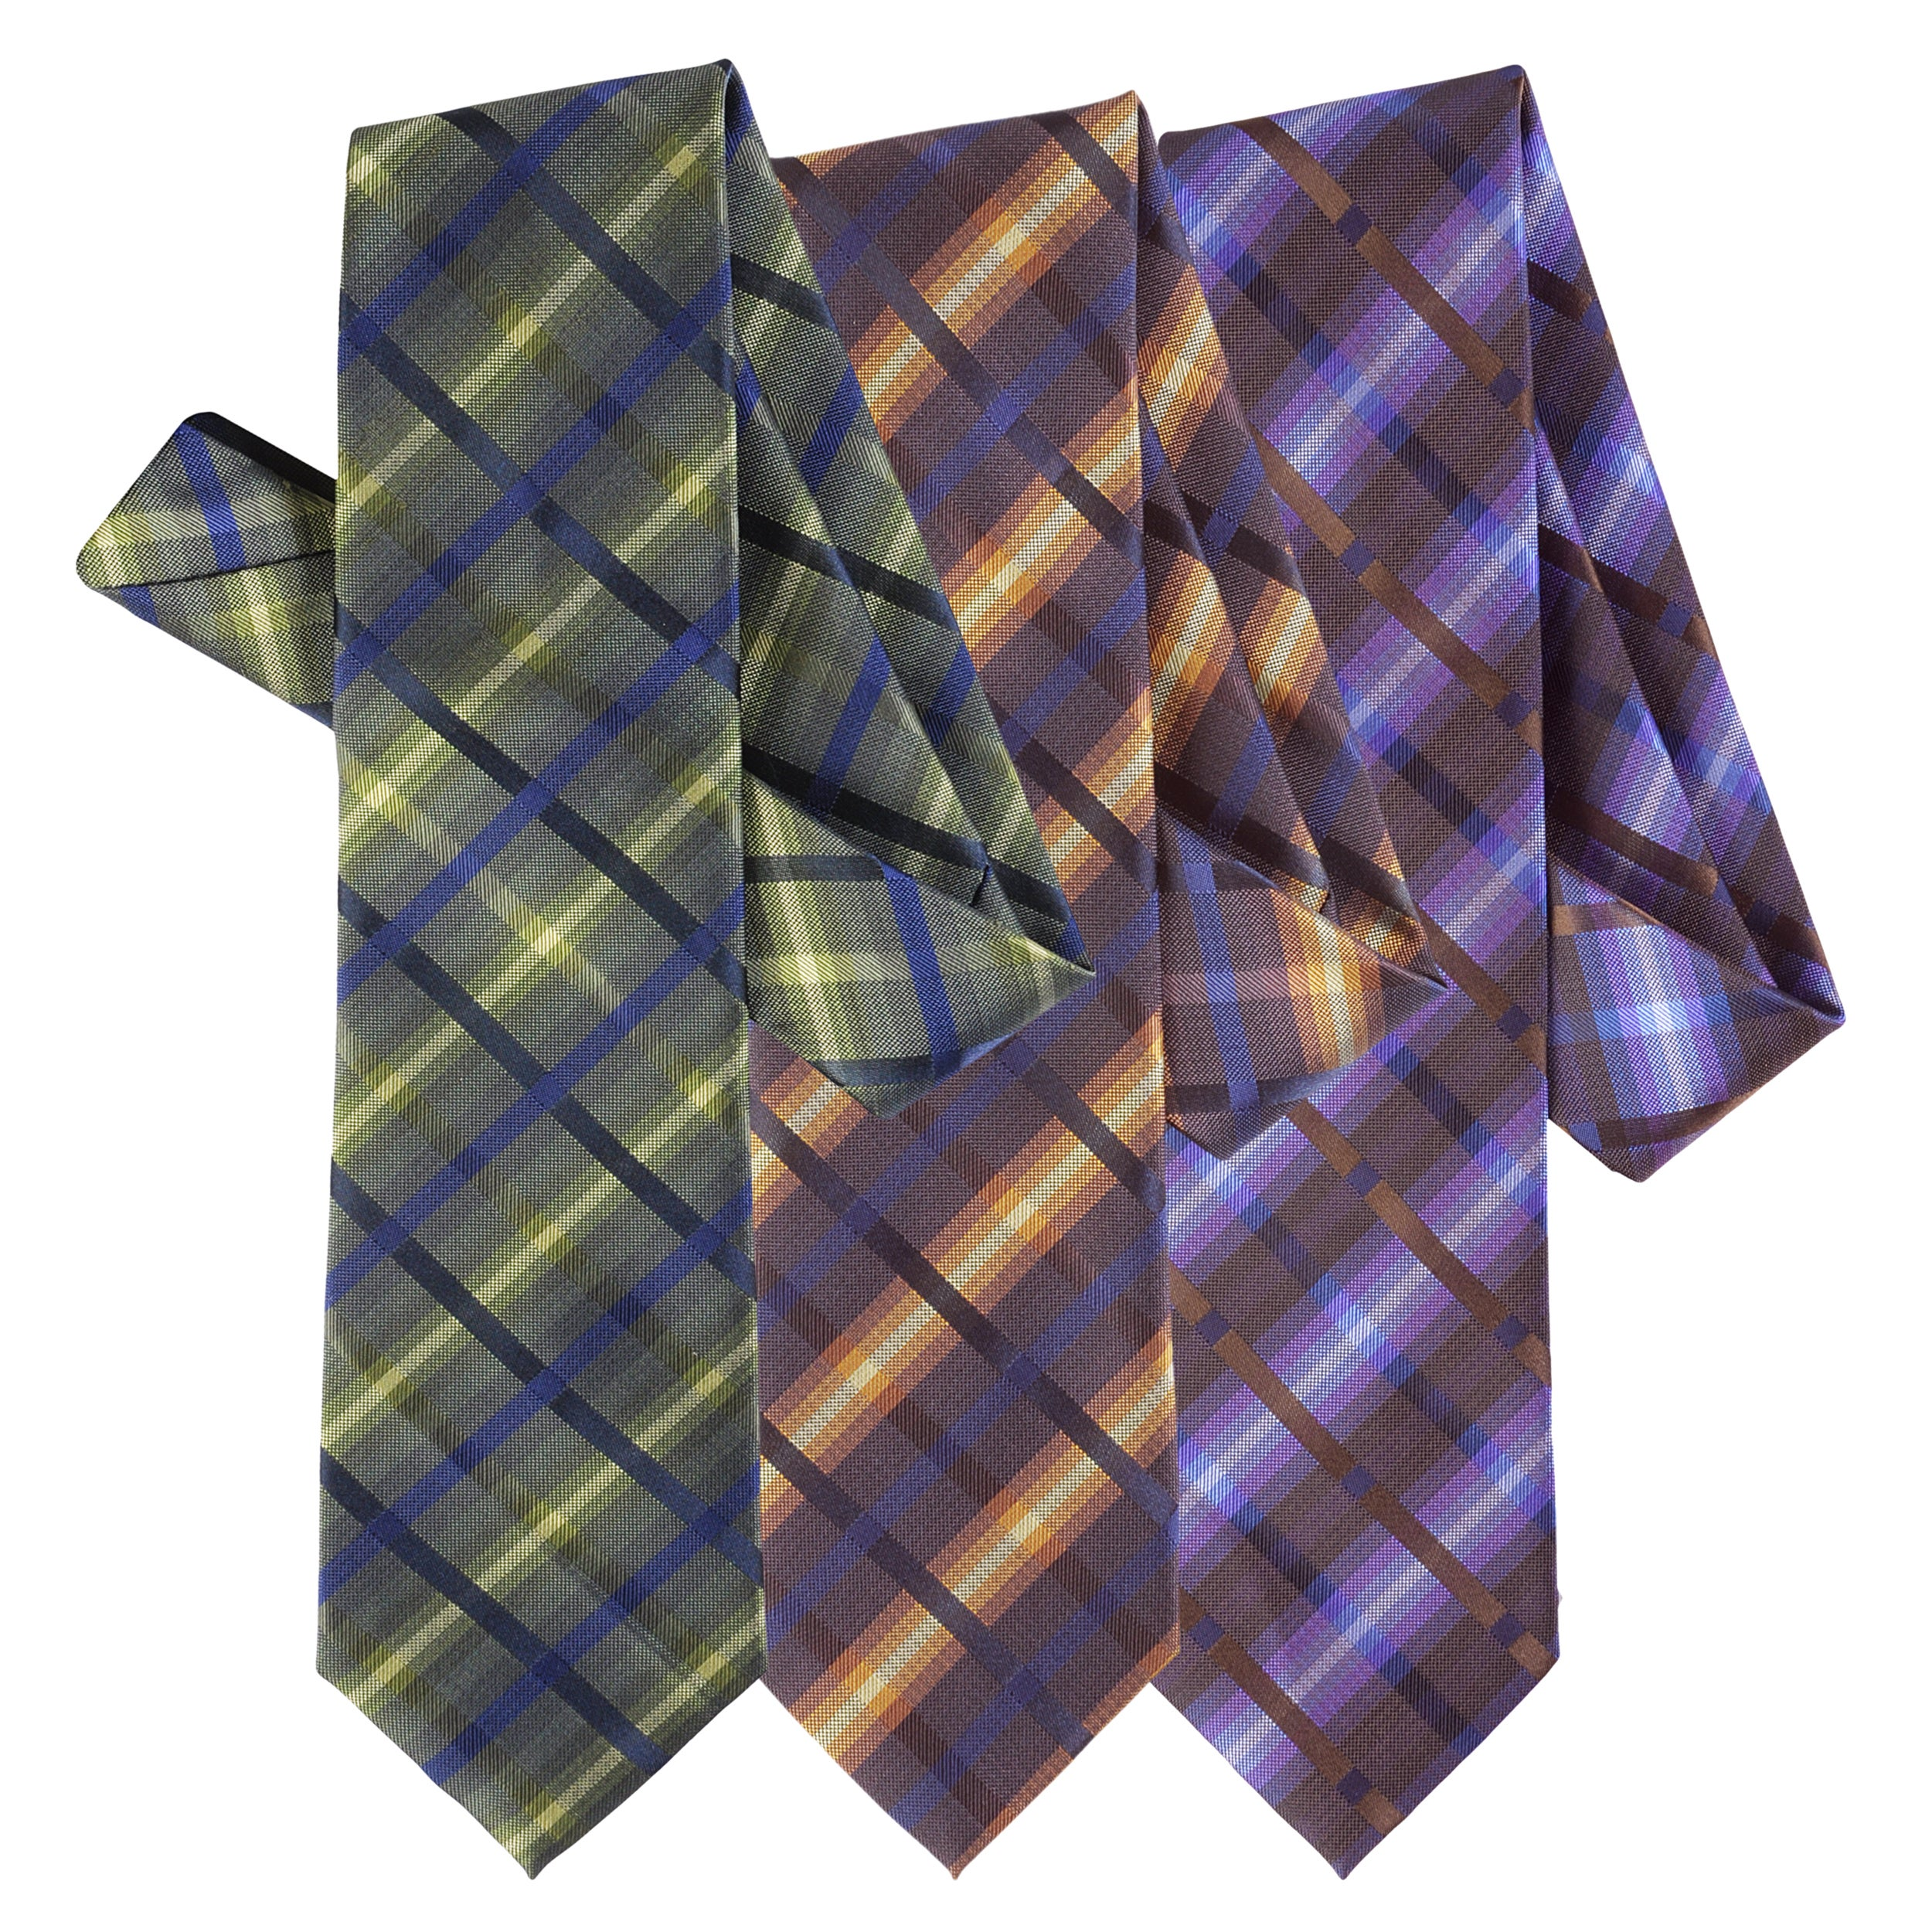 Boston Traveler Men's Plaid Microfiber Tie and Hanky Set